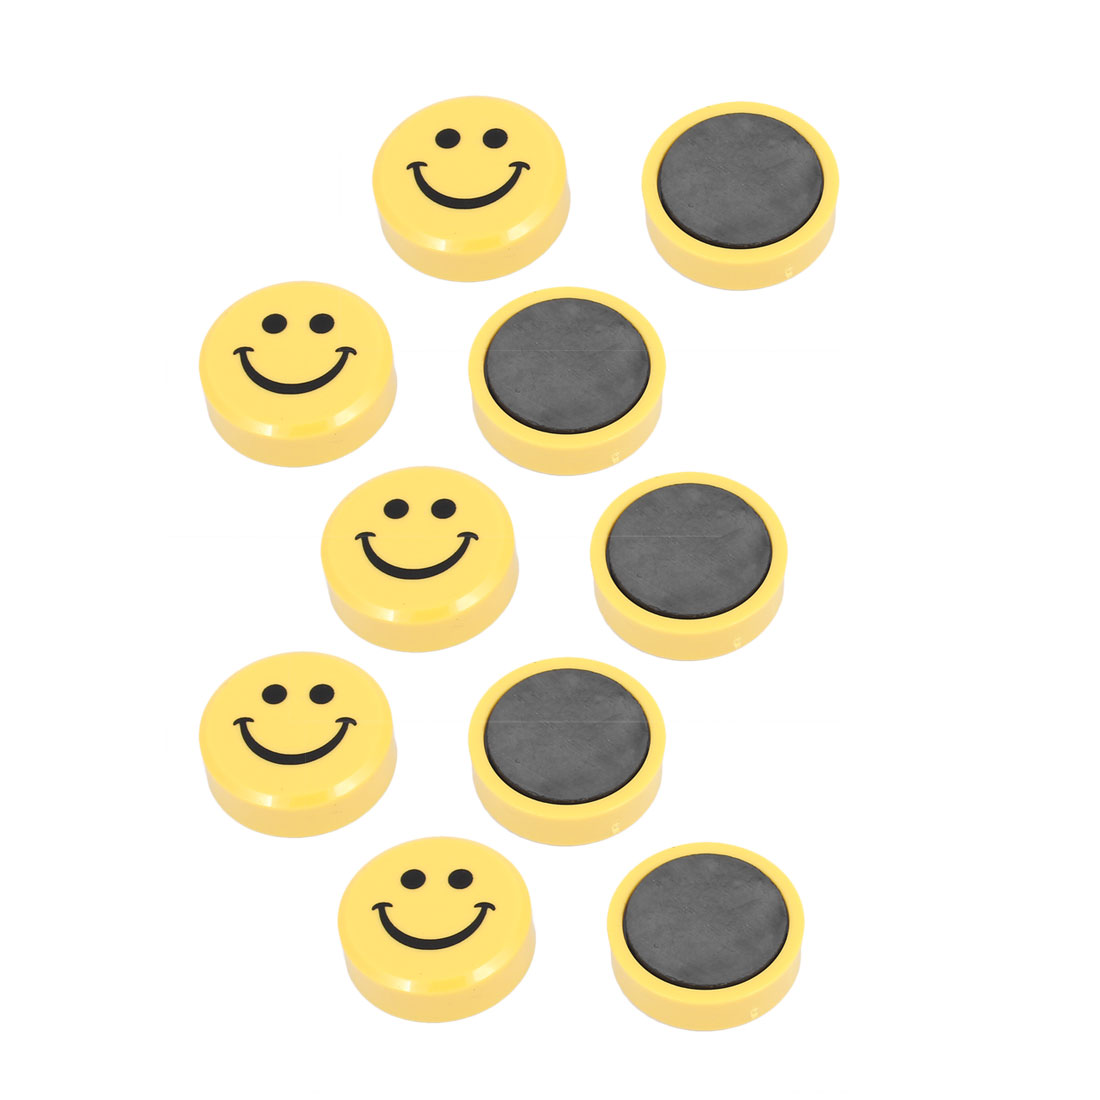 Home School Office Smile Face Pattern Blackboard Fridge Magnetic Stickers Yellow 10 Pcs